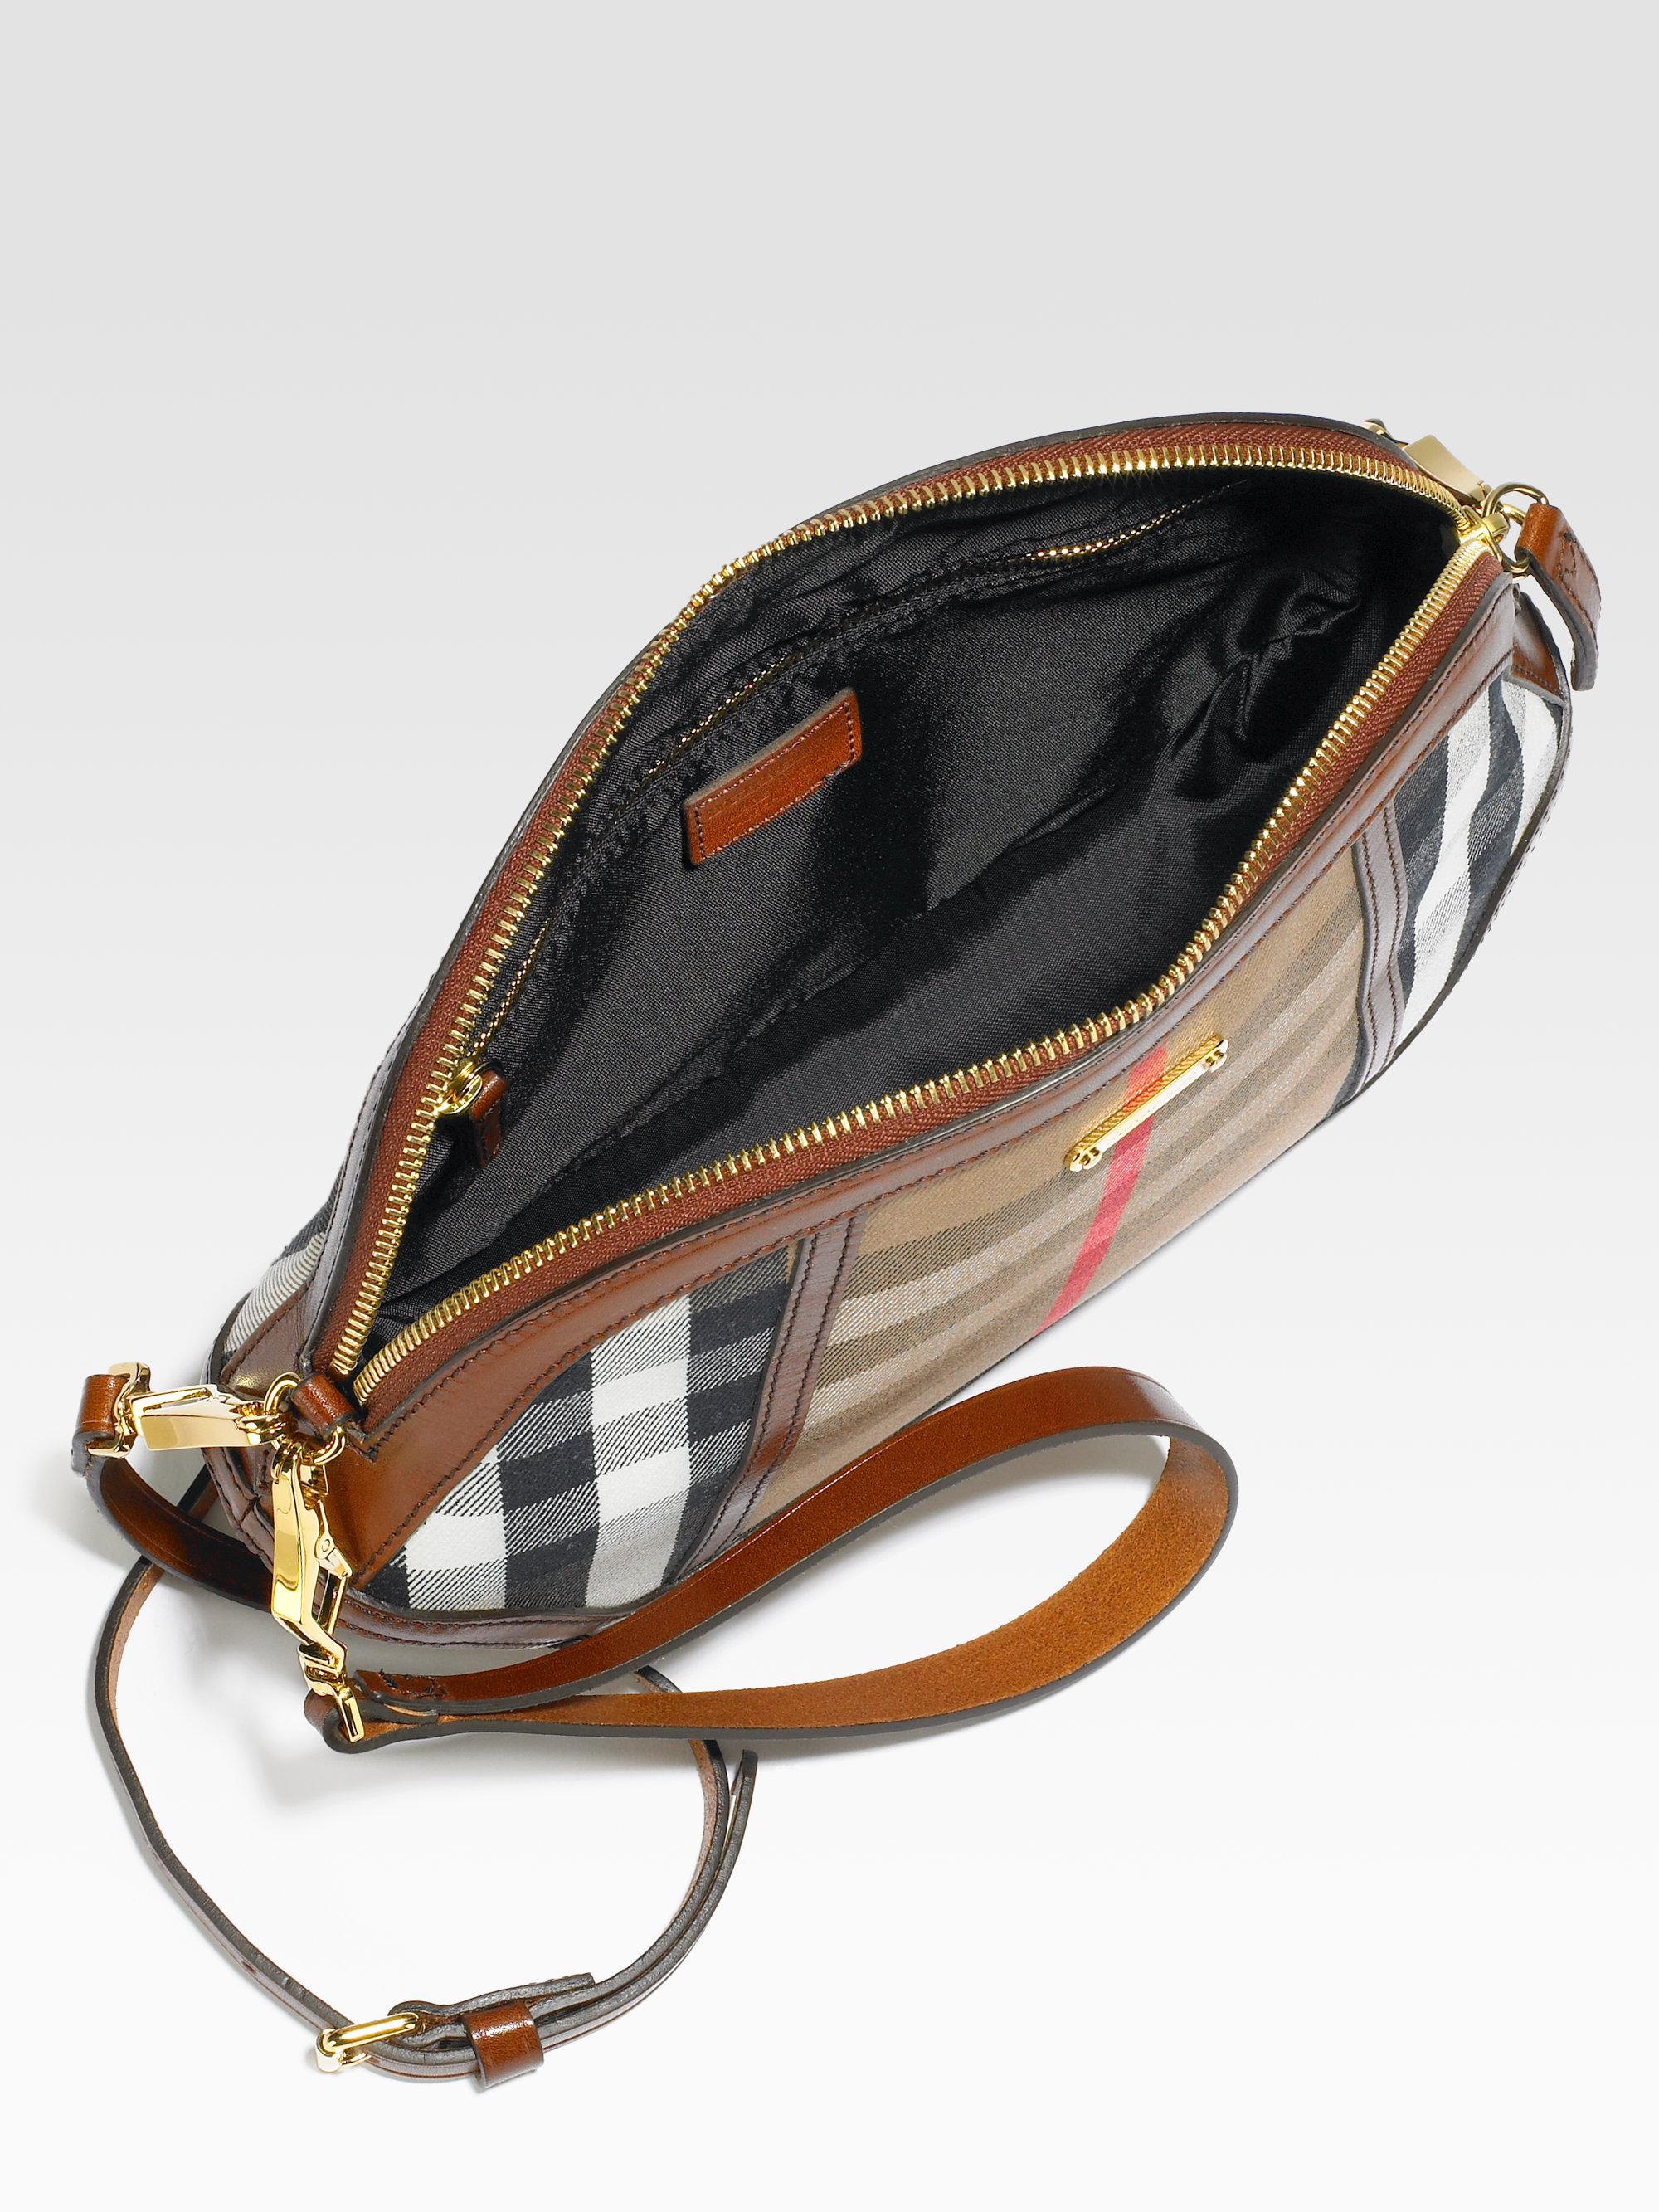 Burberry Orchard Crossbody Bag in Dark Tan (Brown) - Lyst